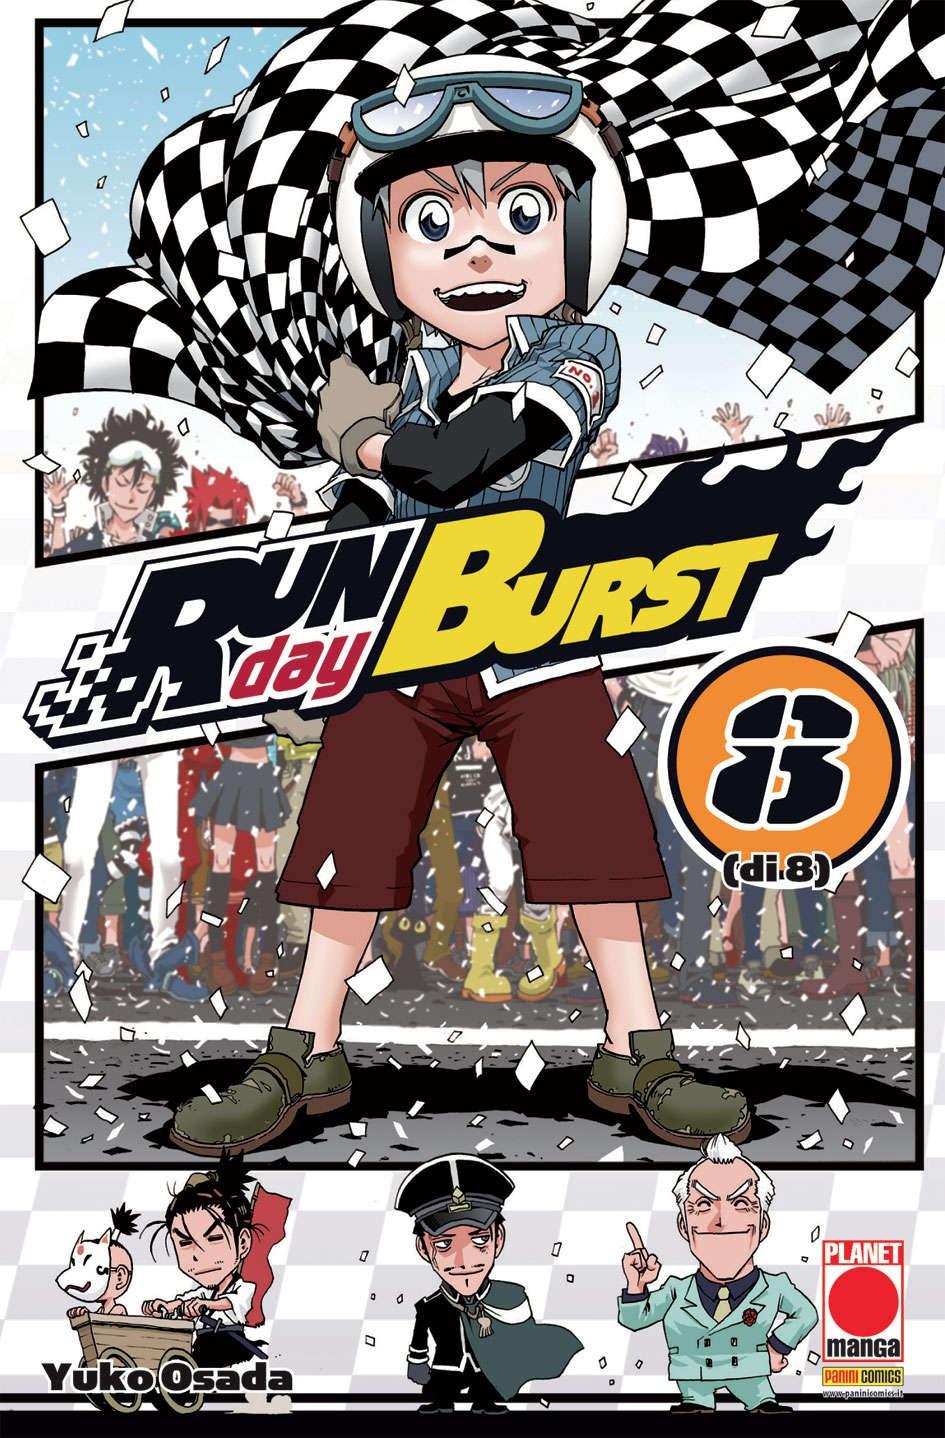 Run Day Burst - N° 8 - Run Day Burst - Planet Manga